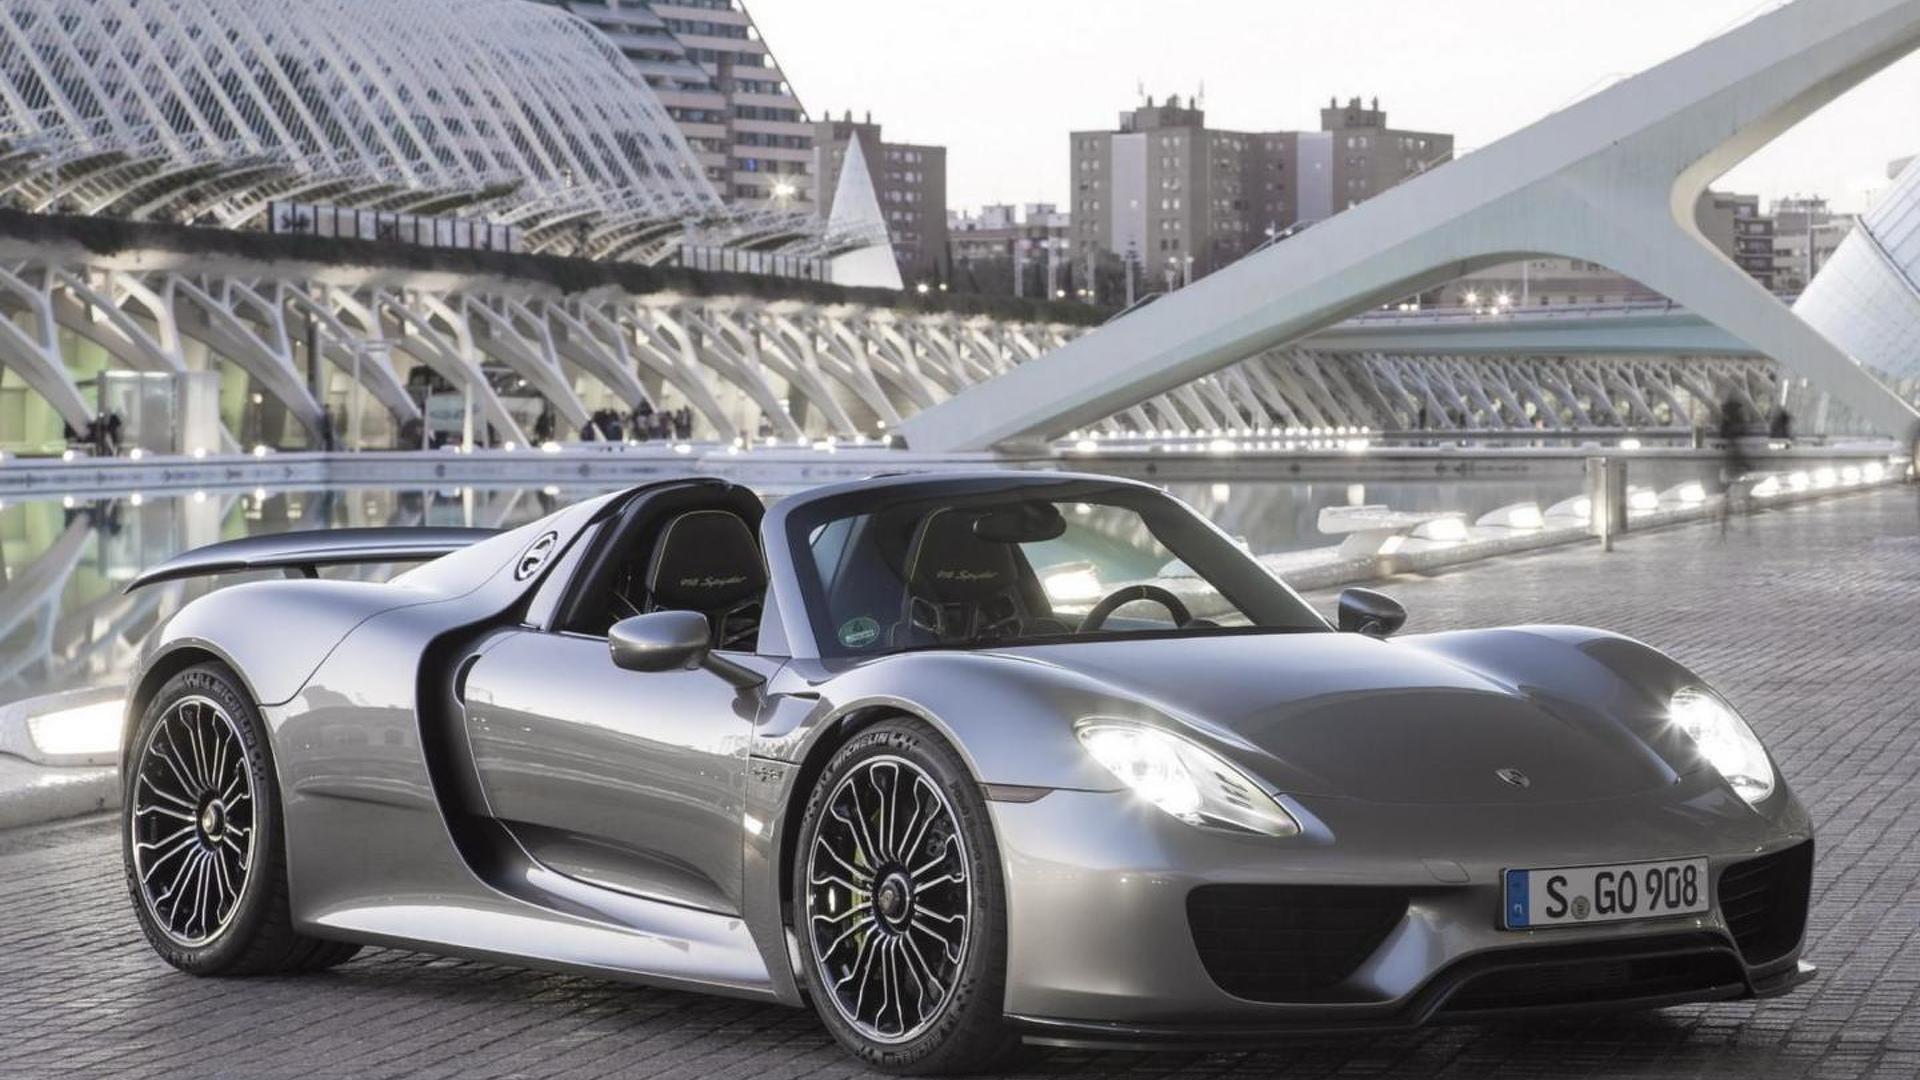 2013-434870-2014-porsche-918-spyder-us-spec1 Amazing Porsche 918 Spyder sold Out Cars Trend